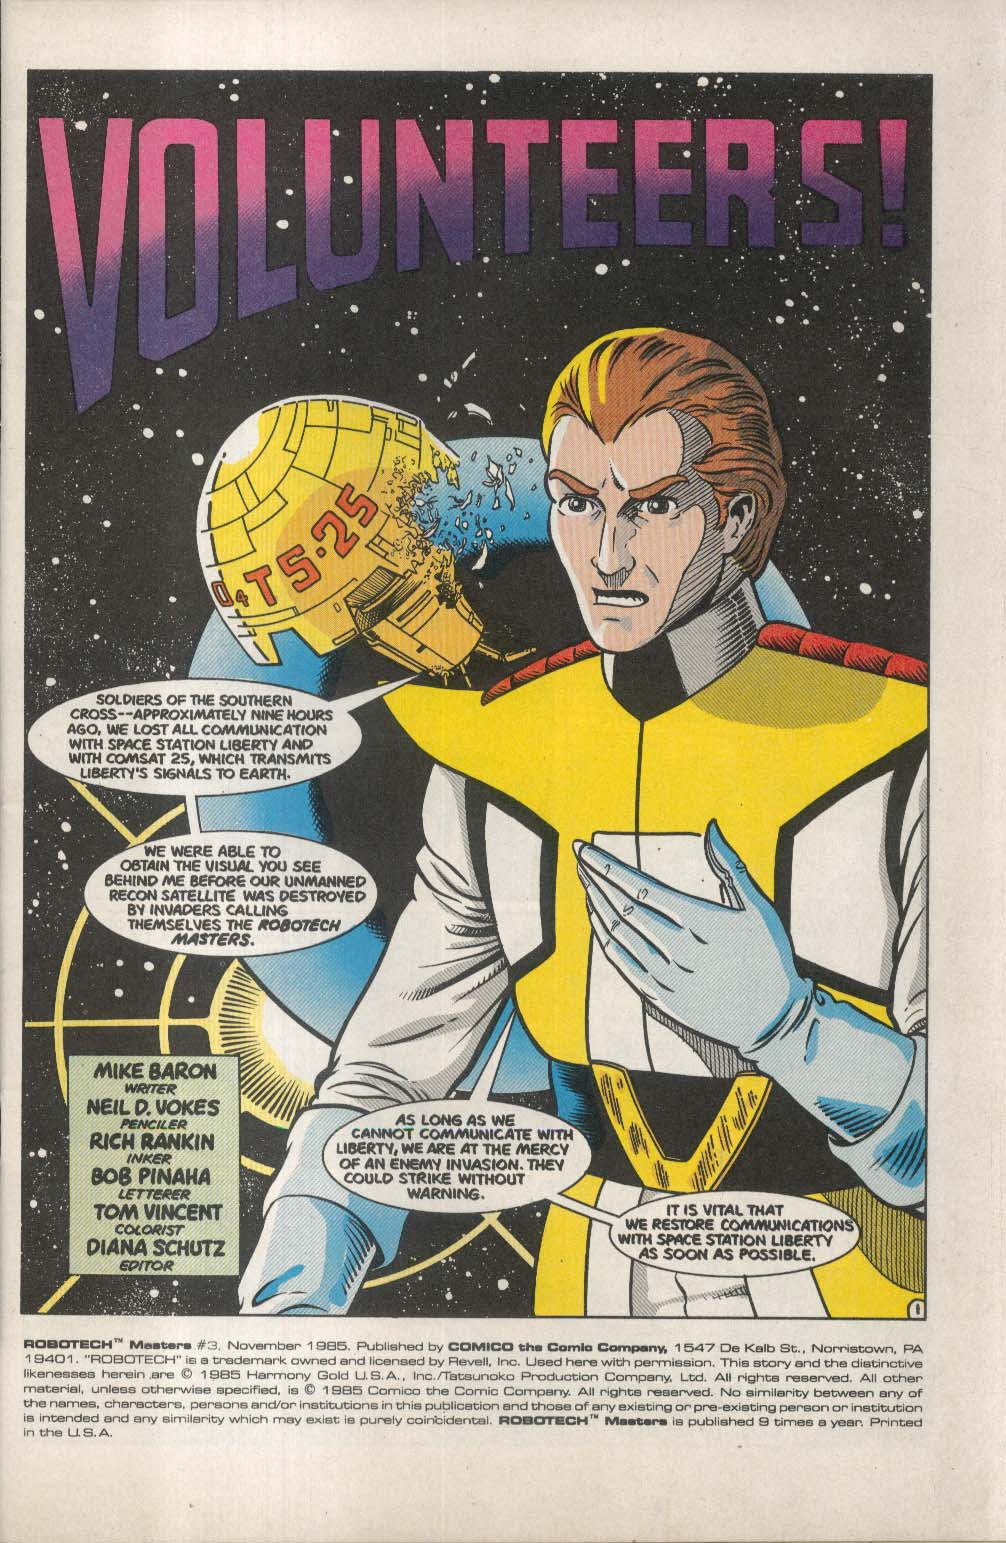 ROBOTECH Masters #3 Comico comic book 11 1985